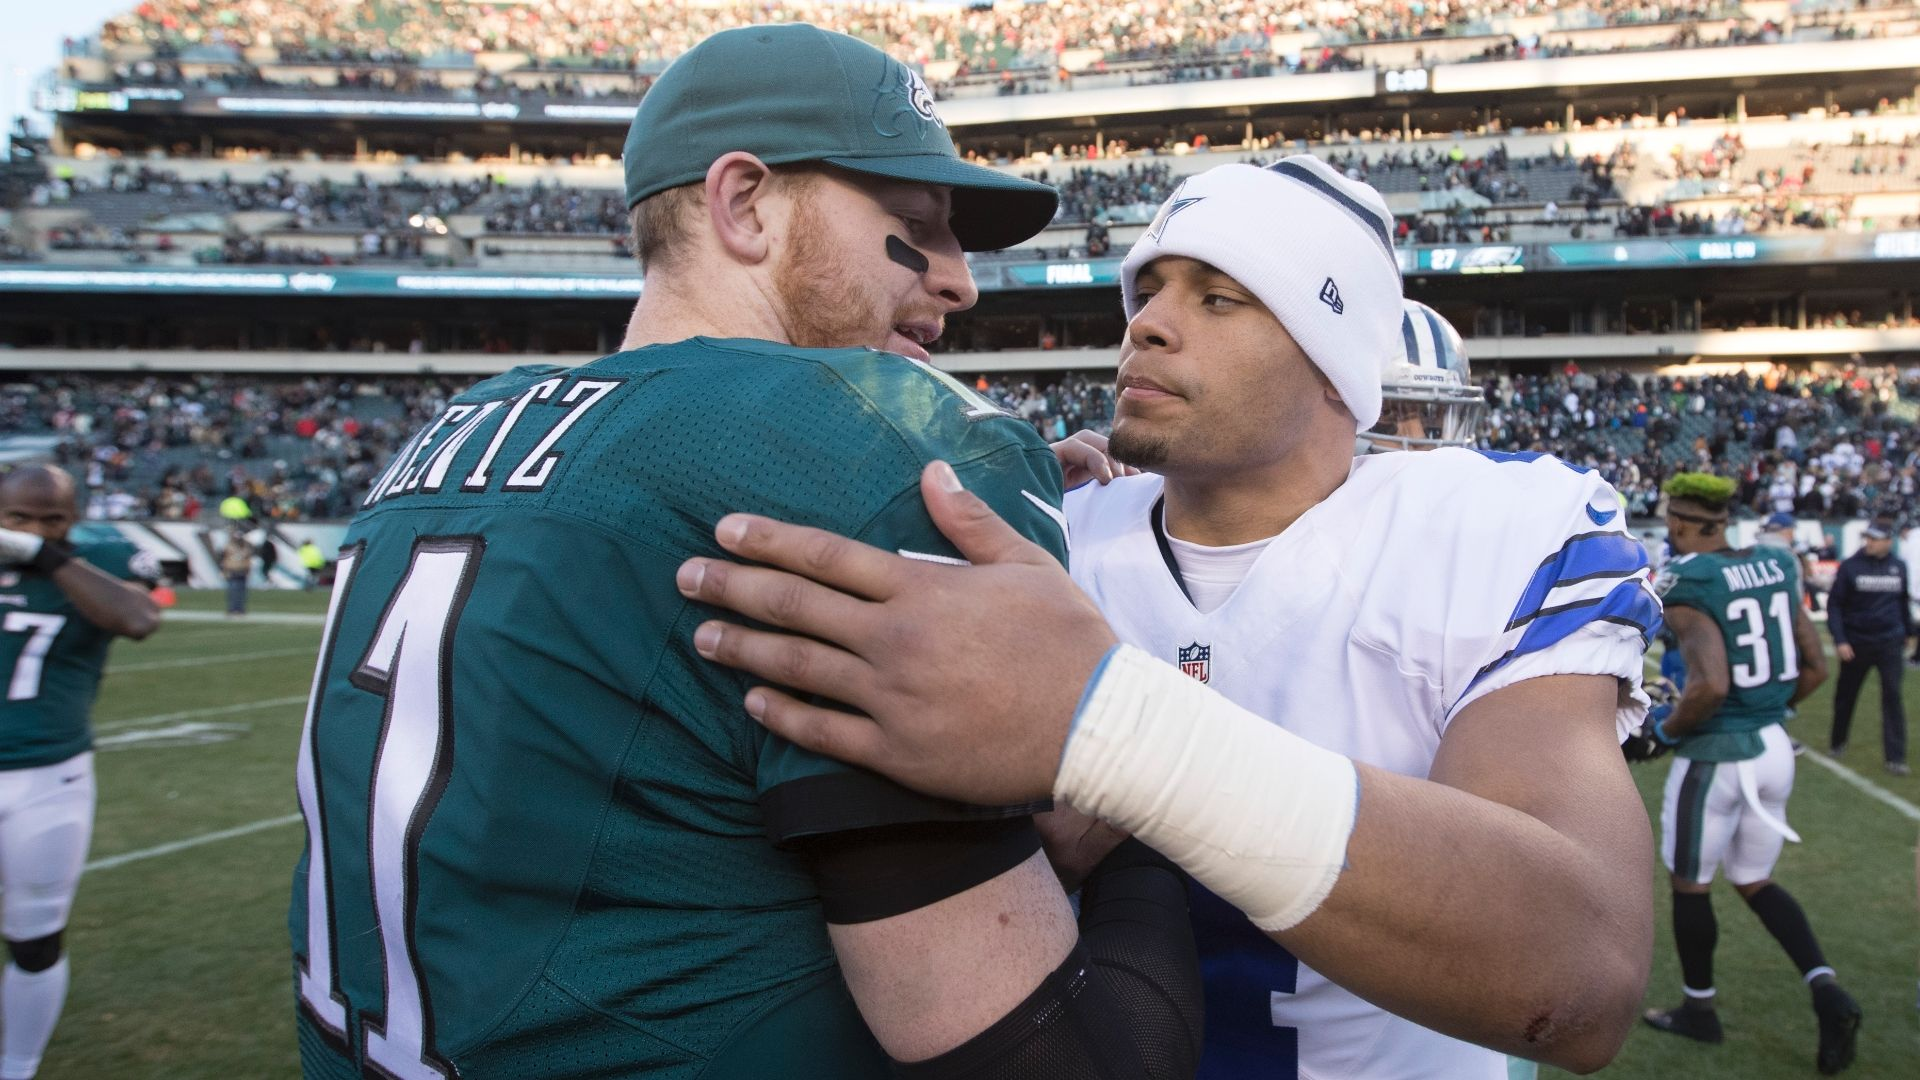 https://secure.espncdn.com/combiner/i?img=/media/motion/2017/1116/dm_171116_NFL_Eagles_vs_Cowboys_ENHANCED/dm_171116_NFL_Eagles_vs_Cowboys_ENHANCED.jpg